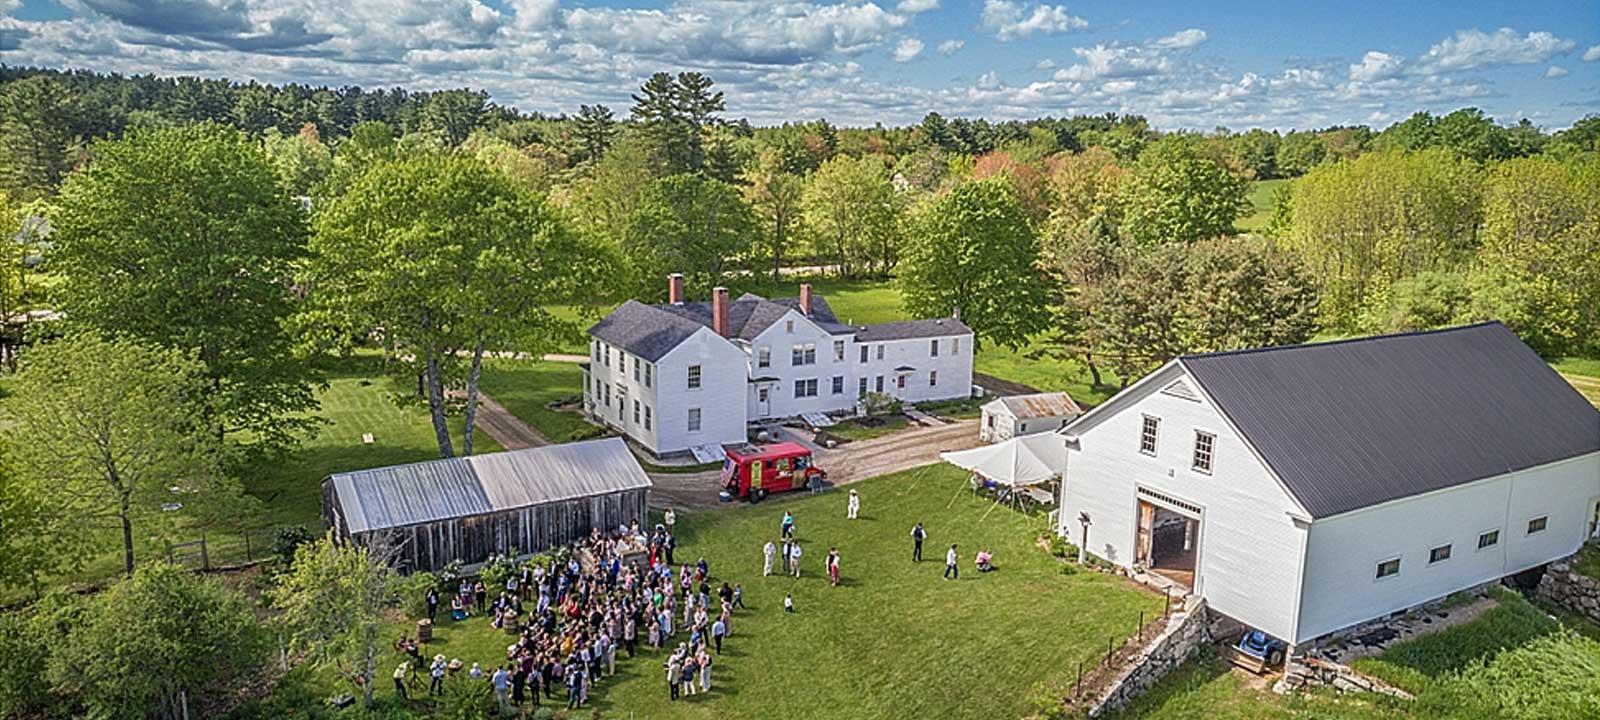 Weddings in Maine